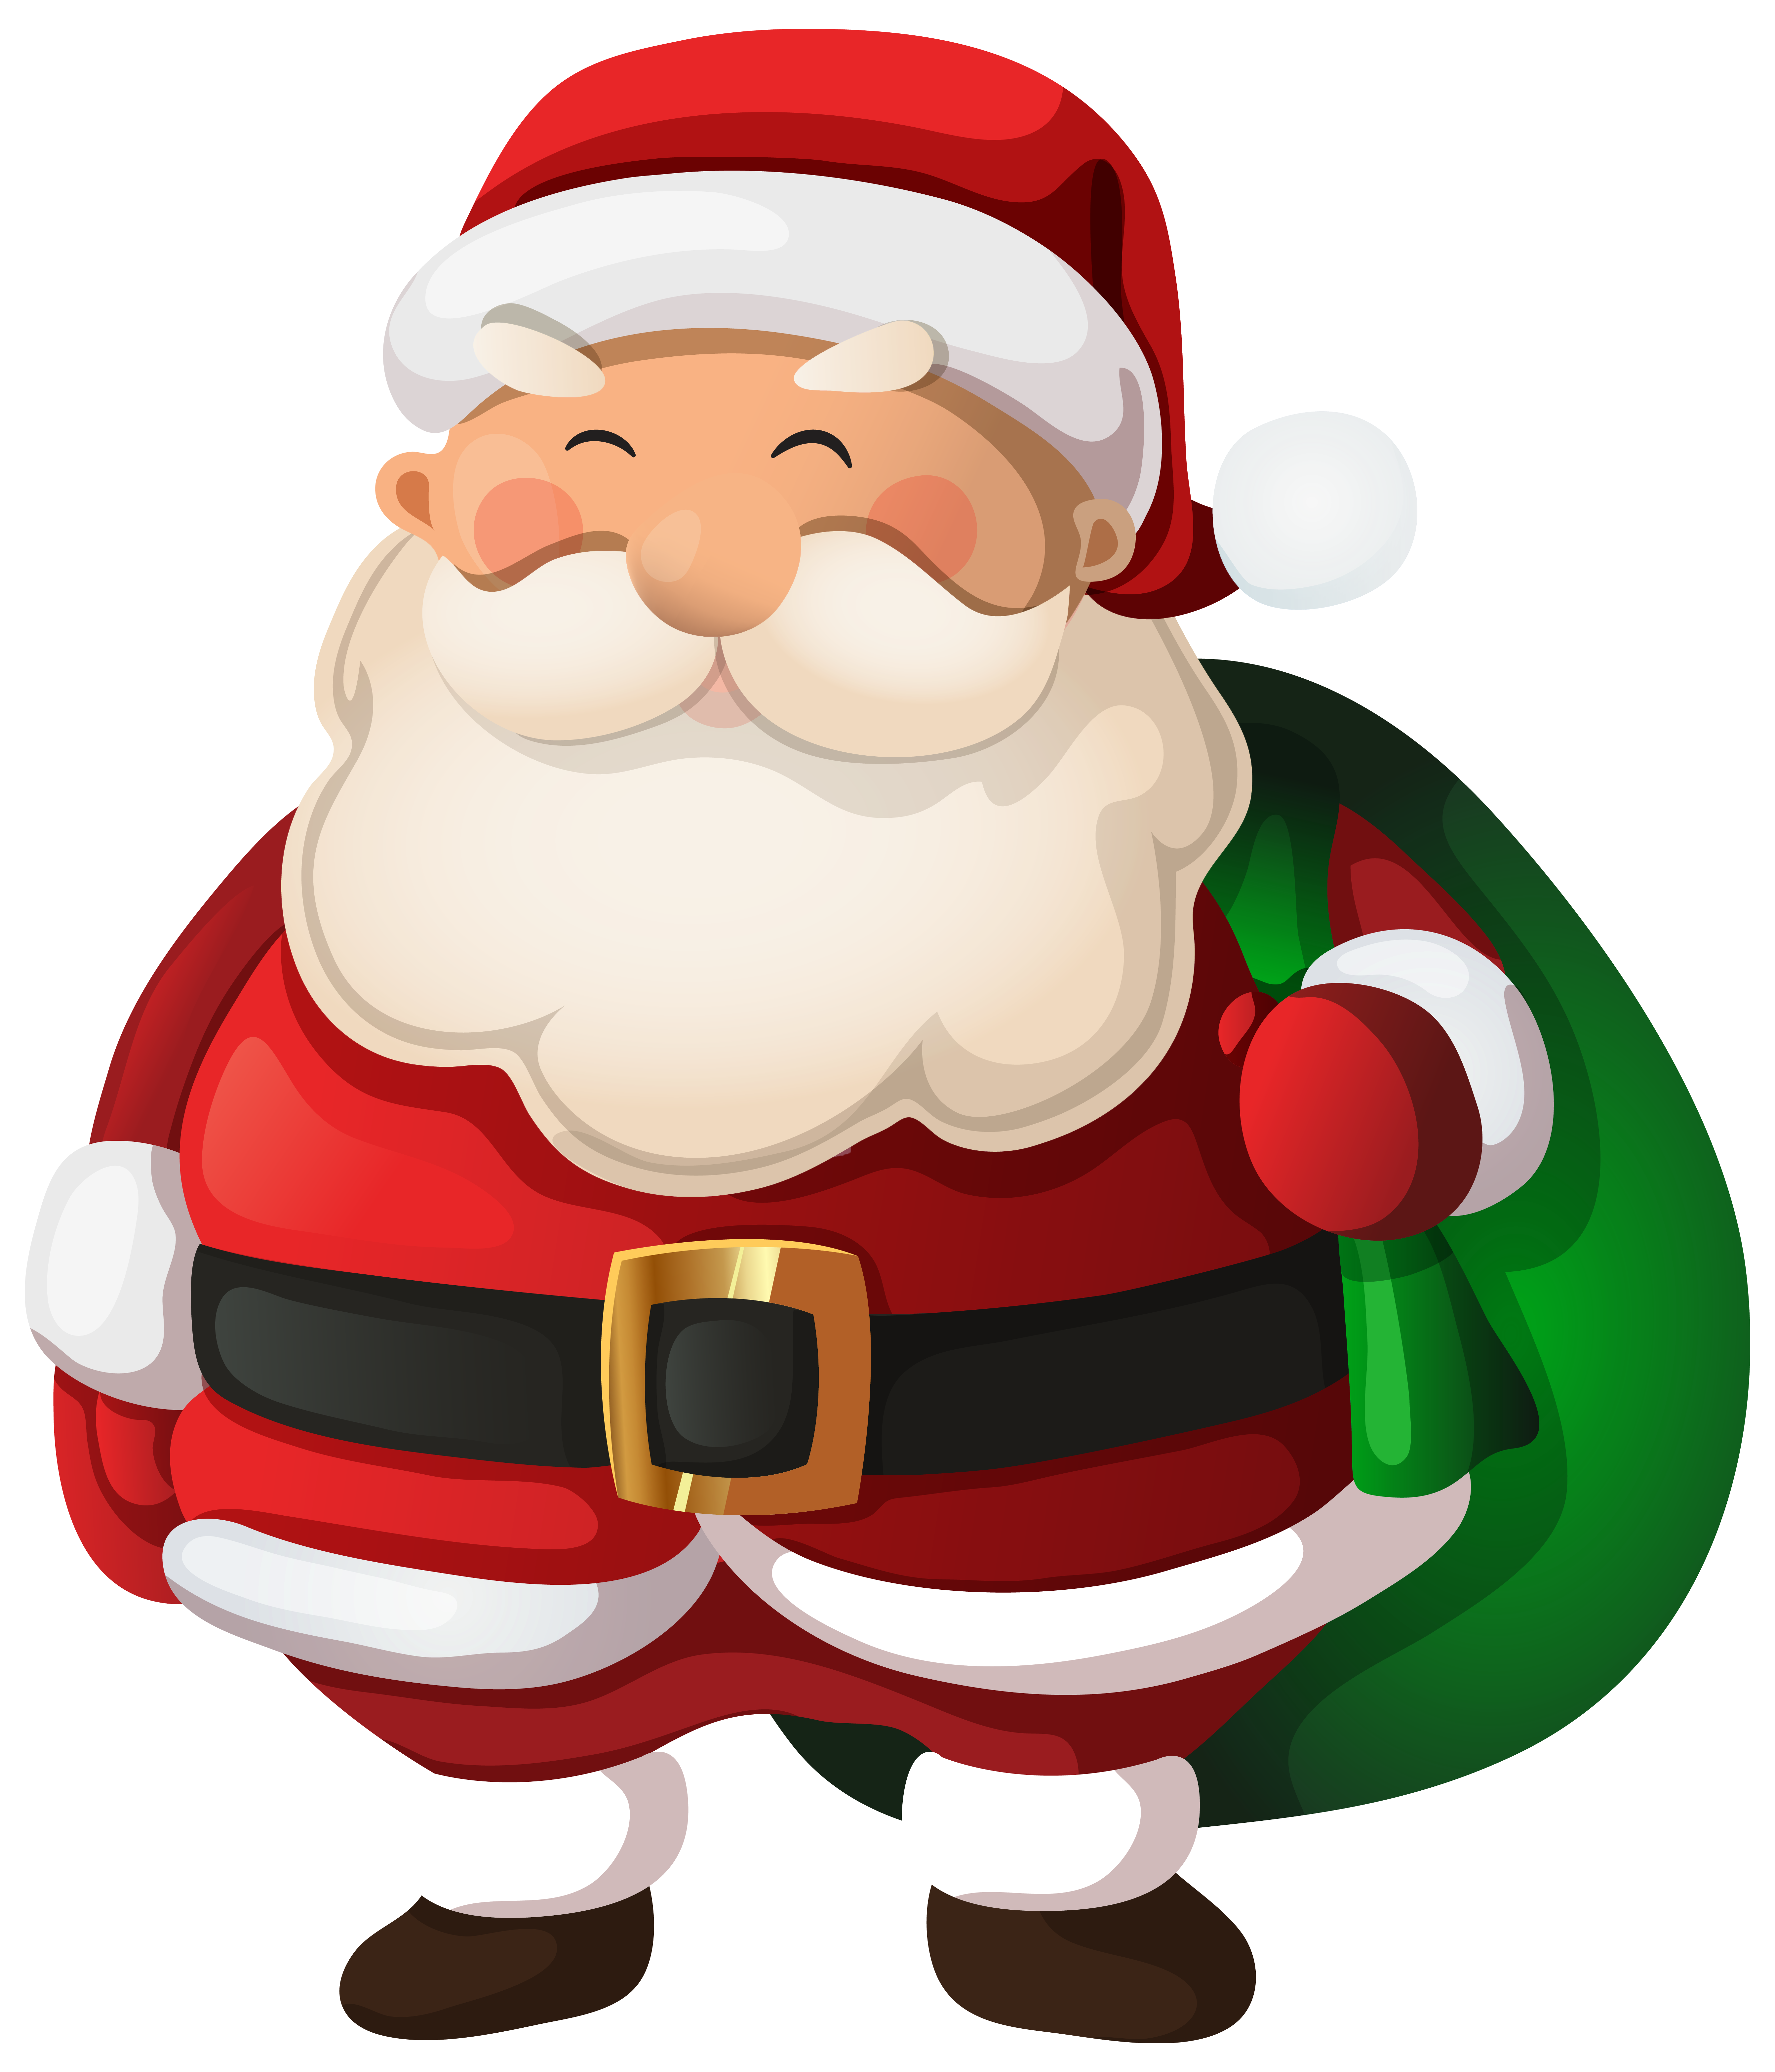 Santa clipart clous #1